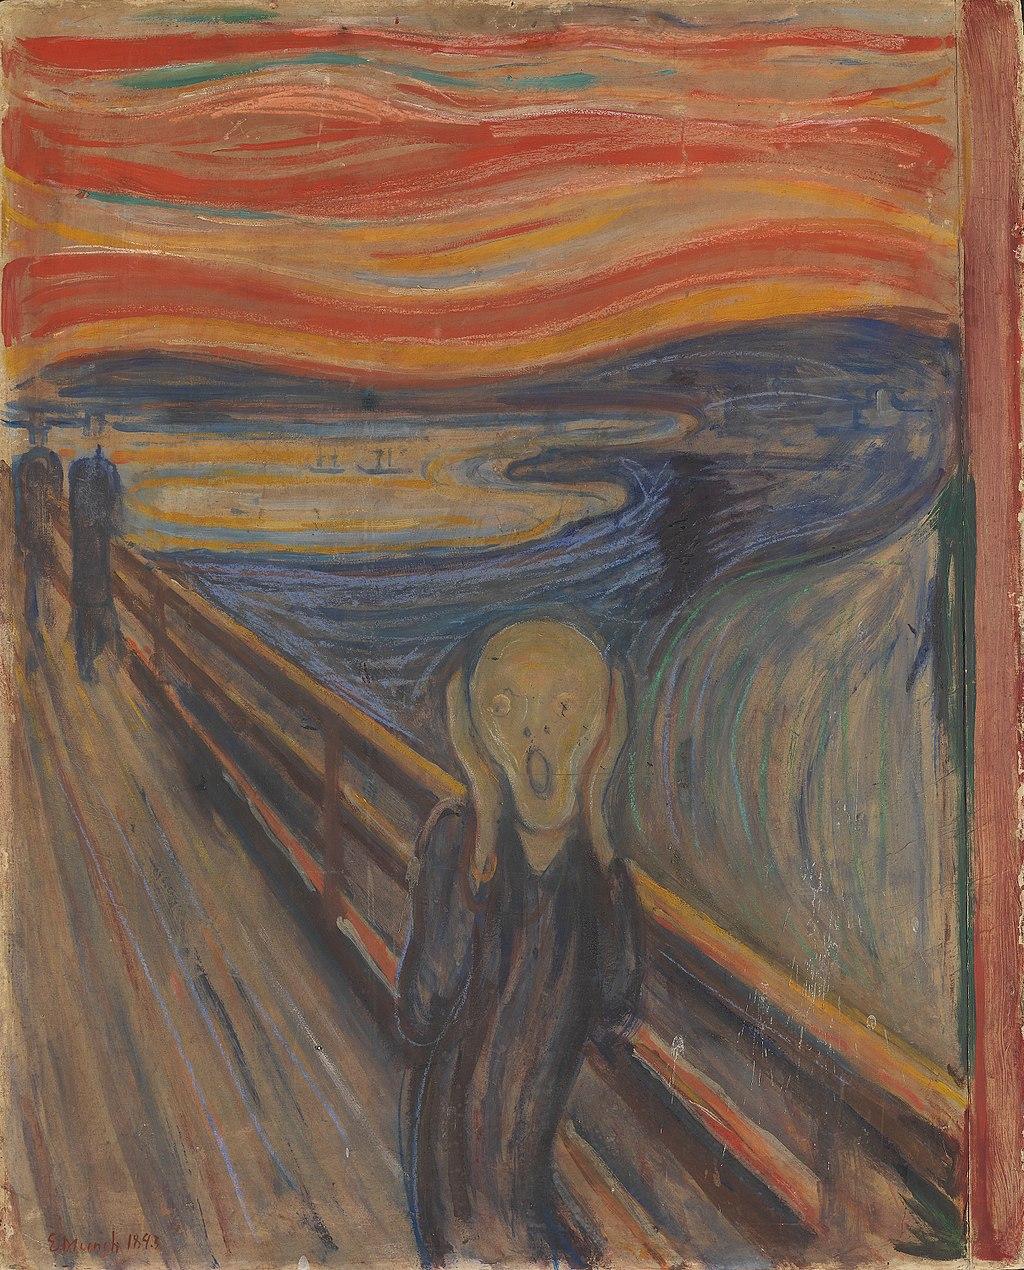 Edvard Munch The Scream 1893, oil, tempera, pastel and crayon cardboard